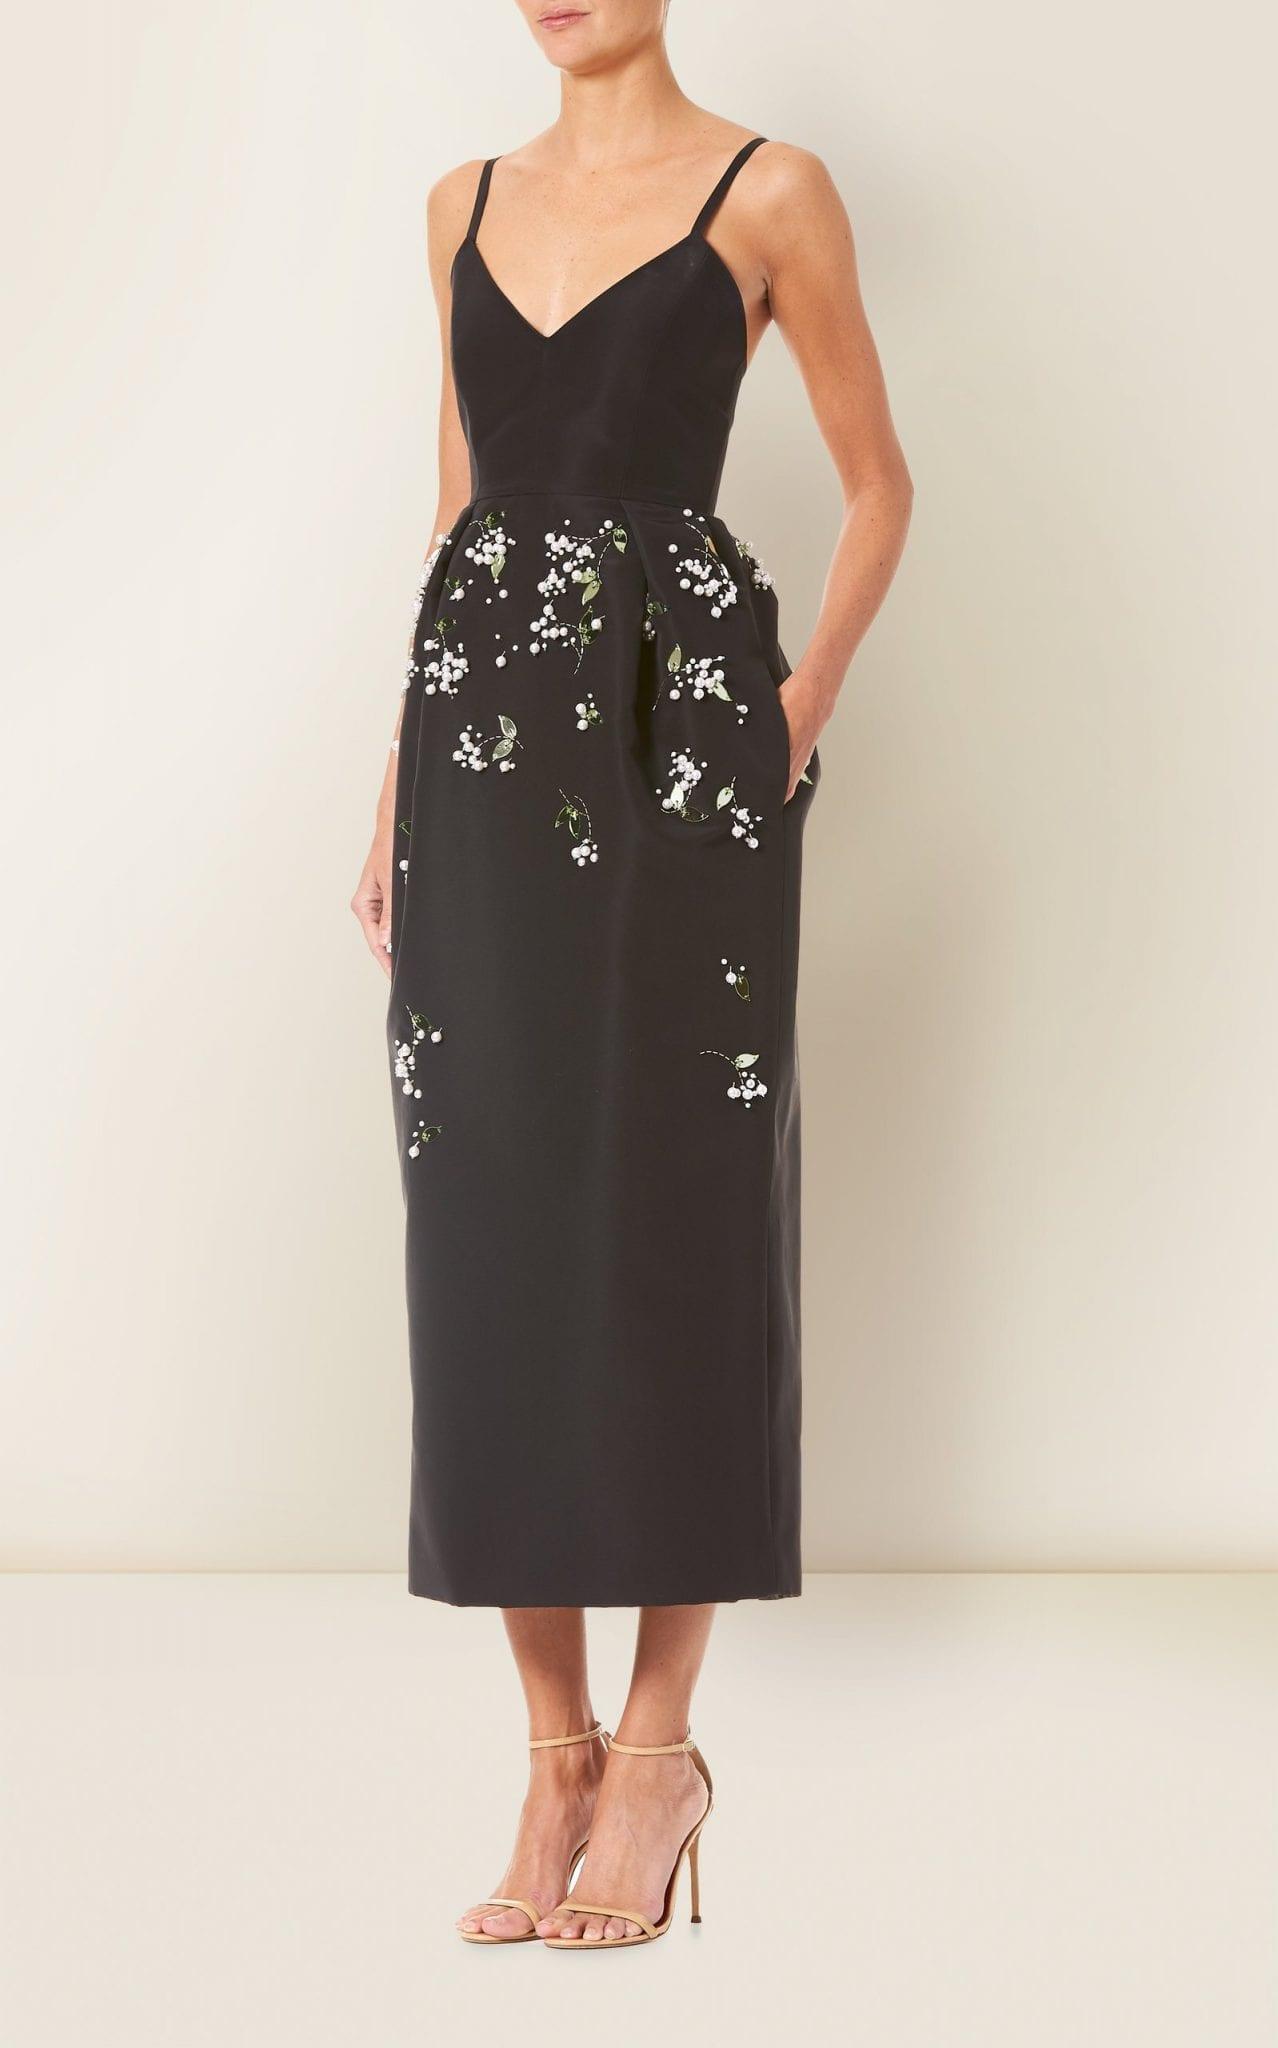 CAROLINA HERRERA Floral-Embroidered Silk-Faille Dress